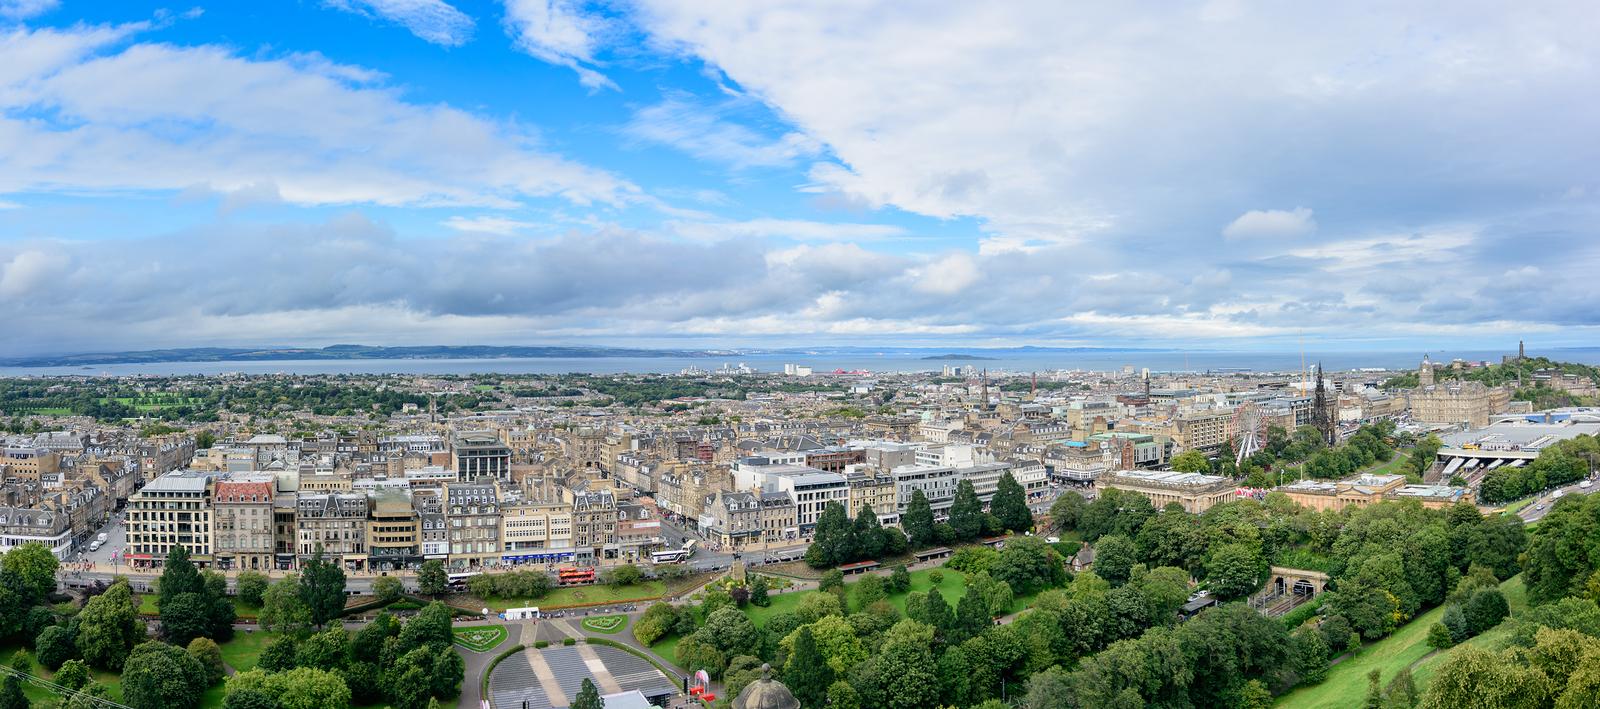 Hyr bil i Edinburgh